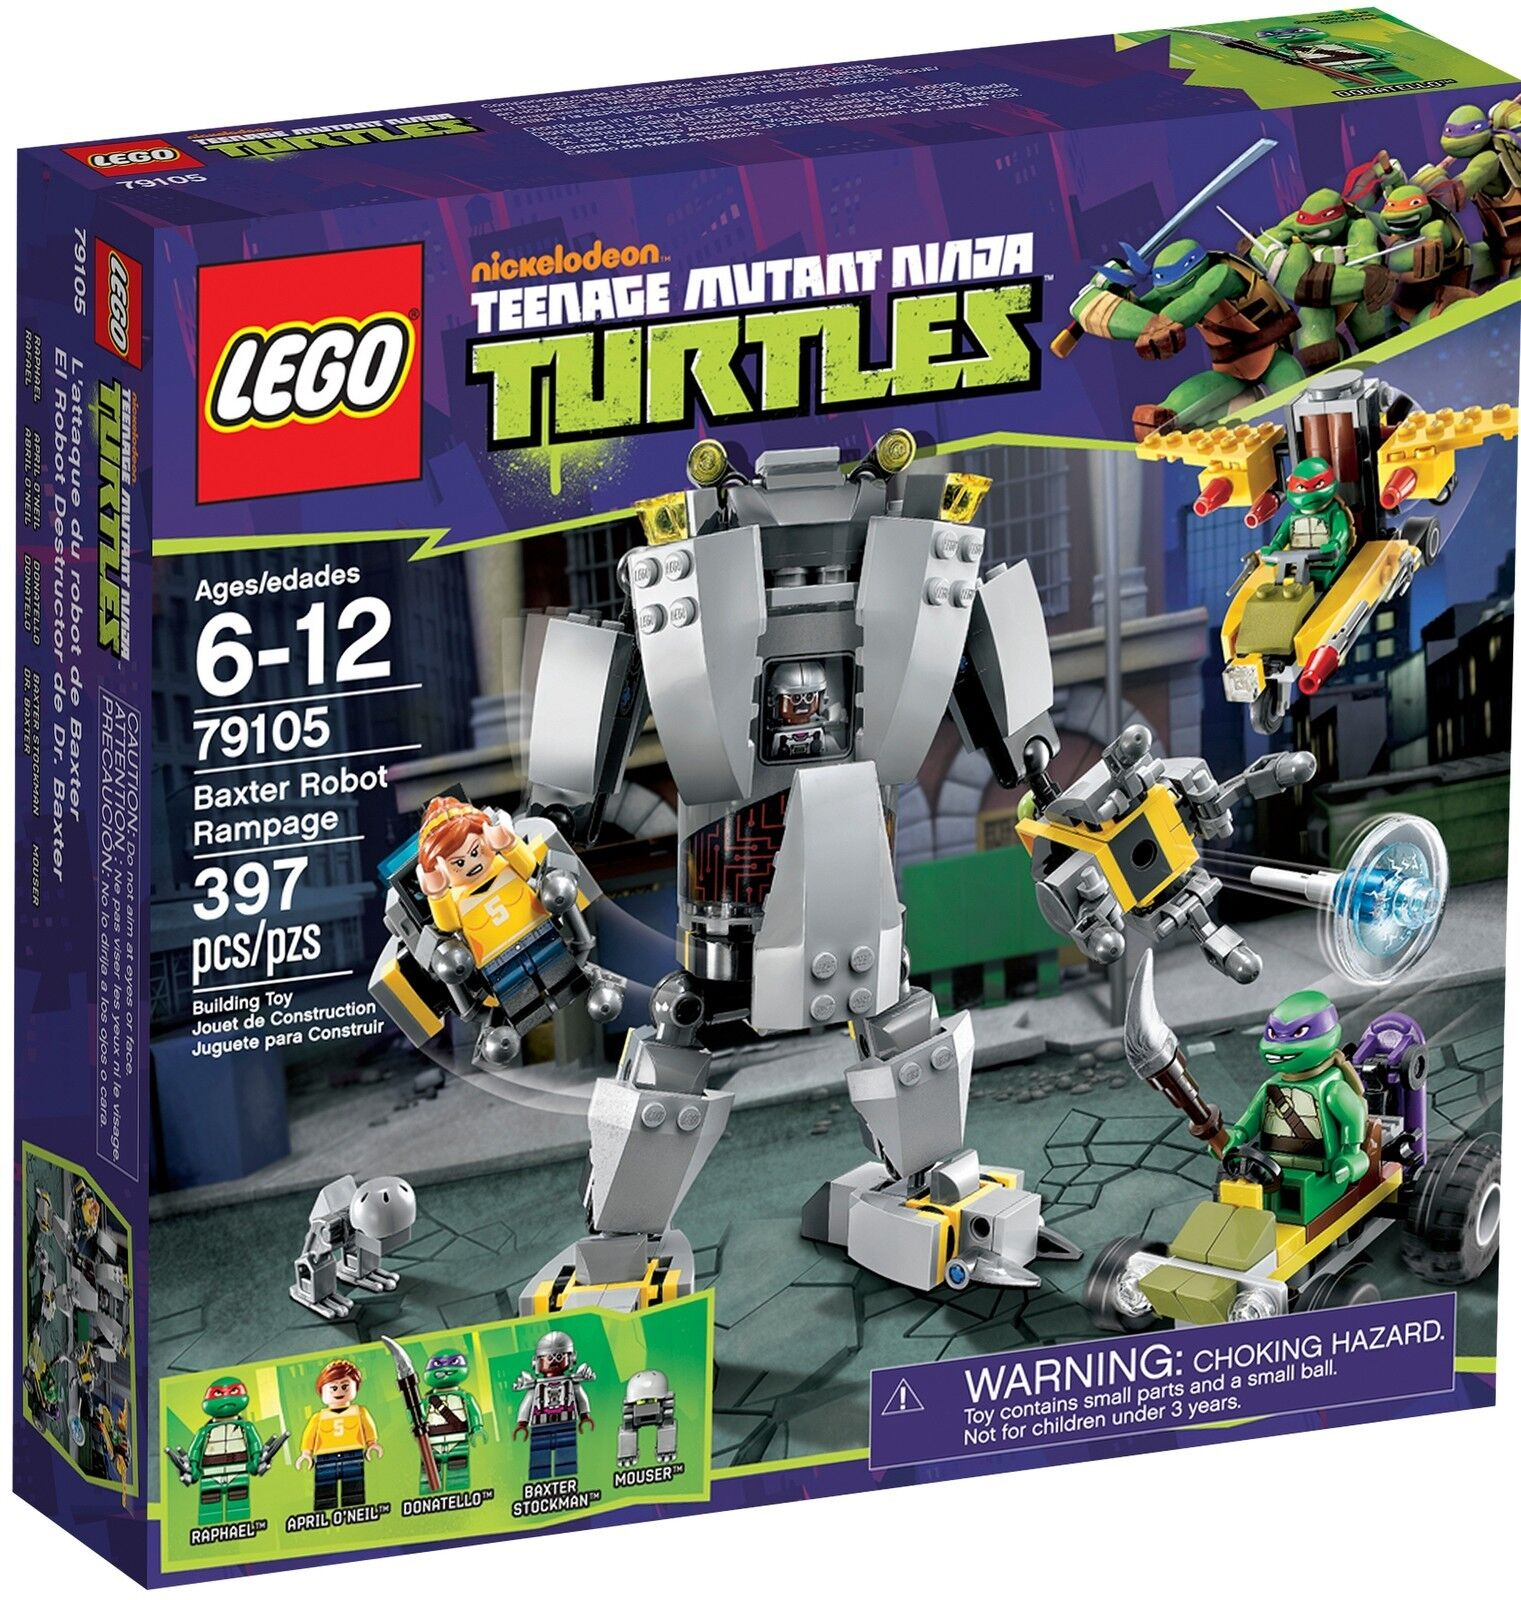 Lego TMNT 79105 BAXTER ROBOT RAMPAGE Raphael April O'Neil Minifig NISB Xmas Gift